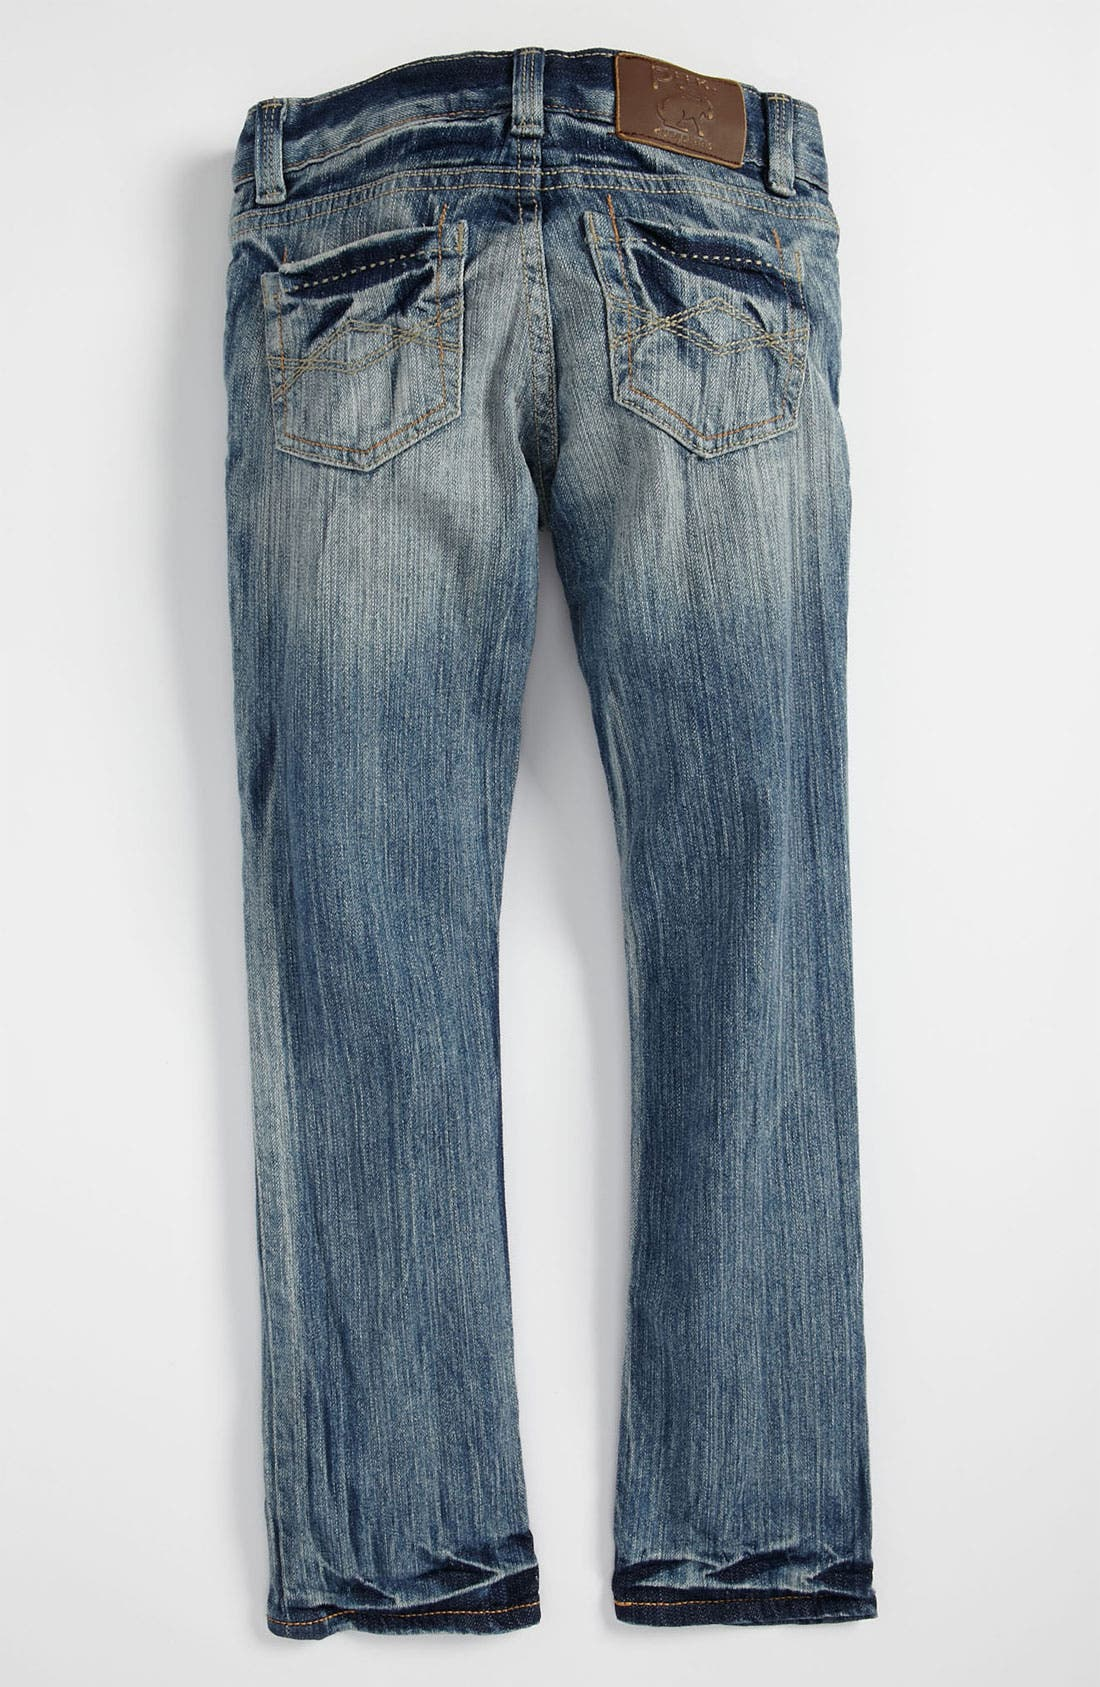 Alternate Image 1 Selected - Peek 'Audrey' Jeans (Toddler Girls, Little Girls & Big Girls)